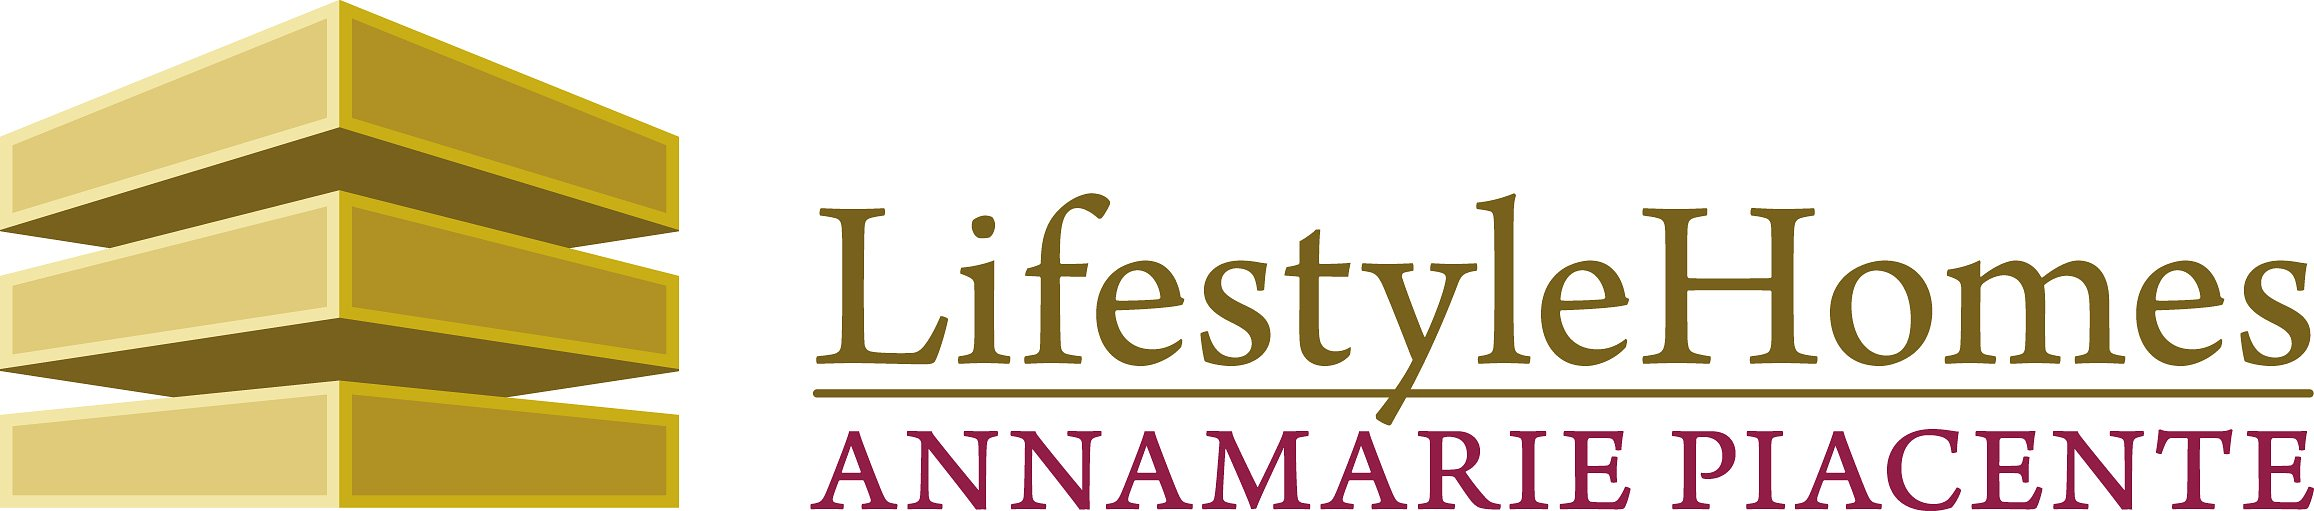 LifestyleHomes Annamarie Piacente AG